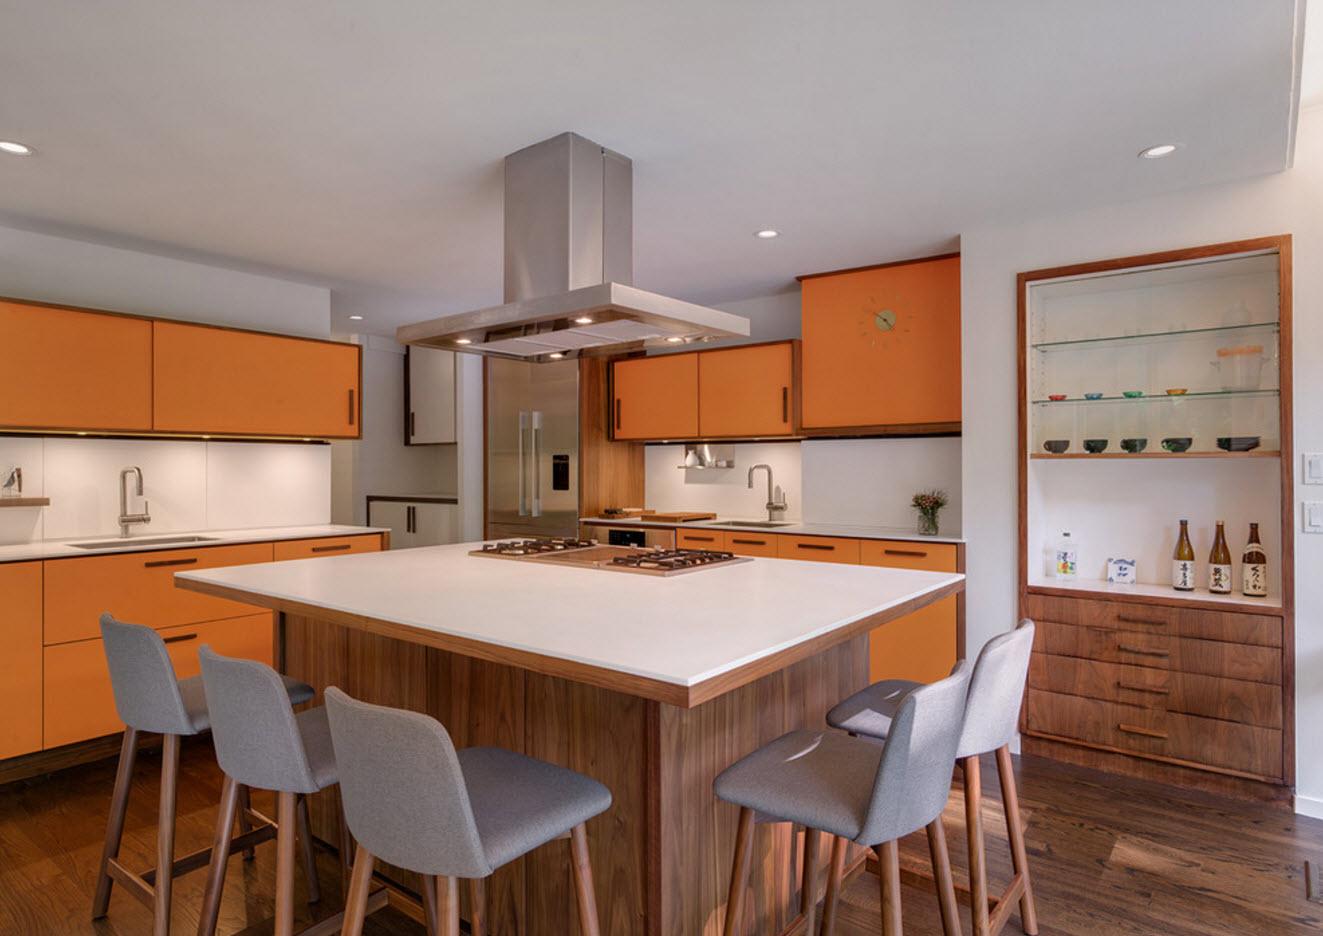 Яркий дизайн кухонного ансамбля